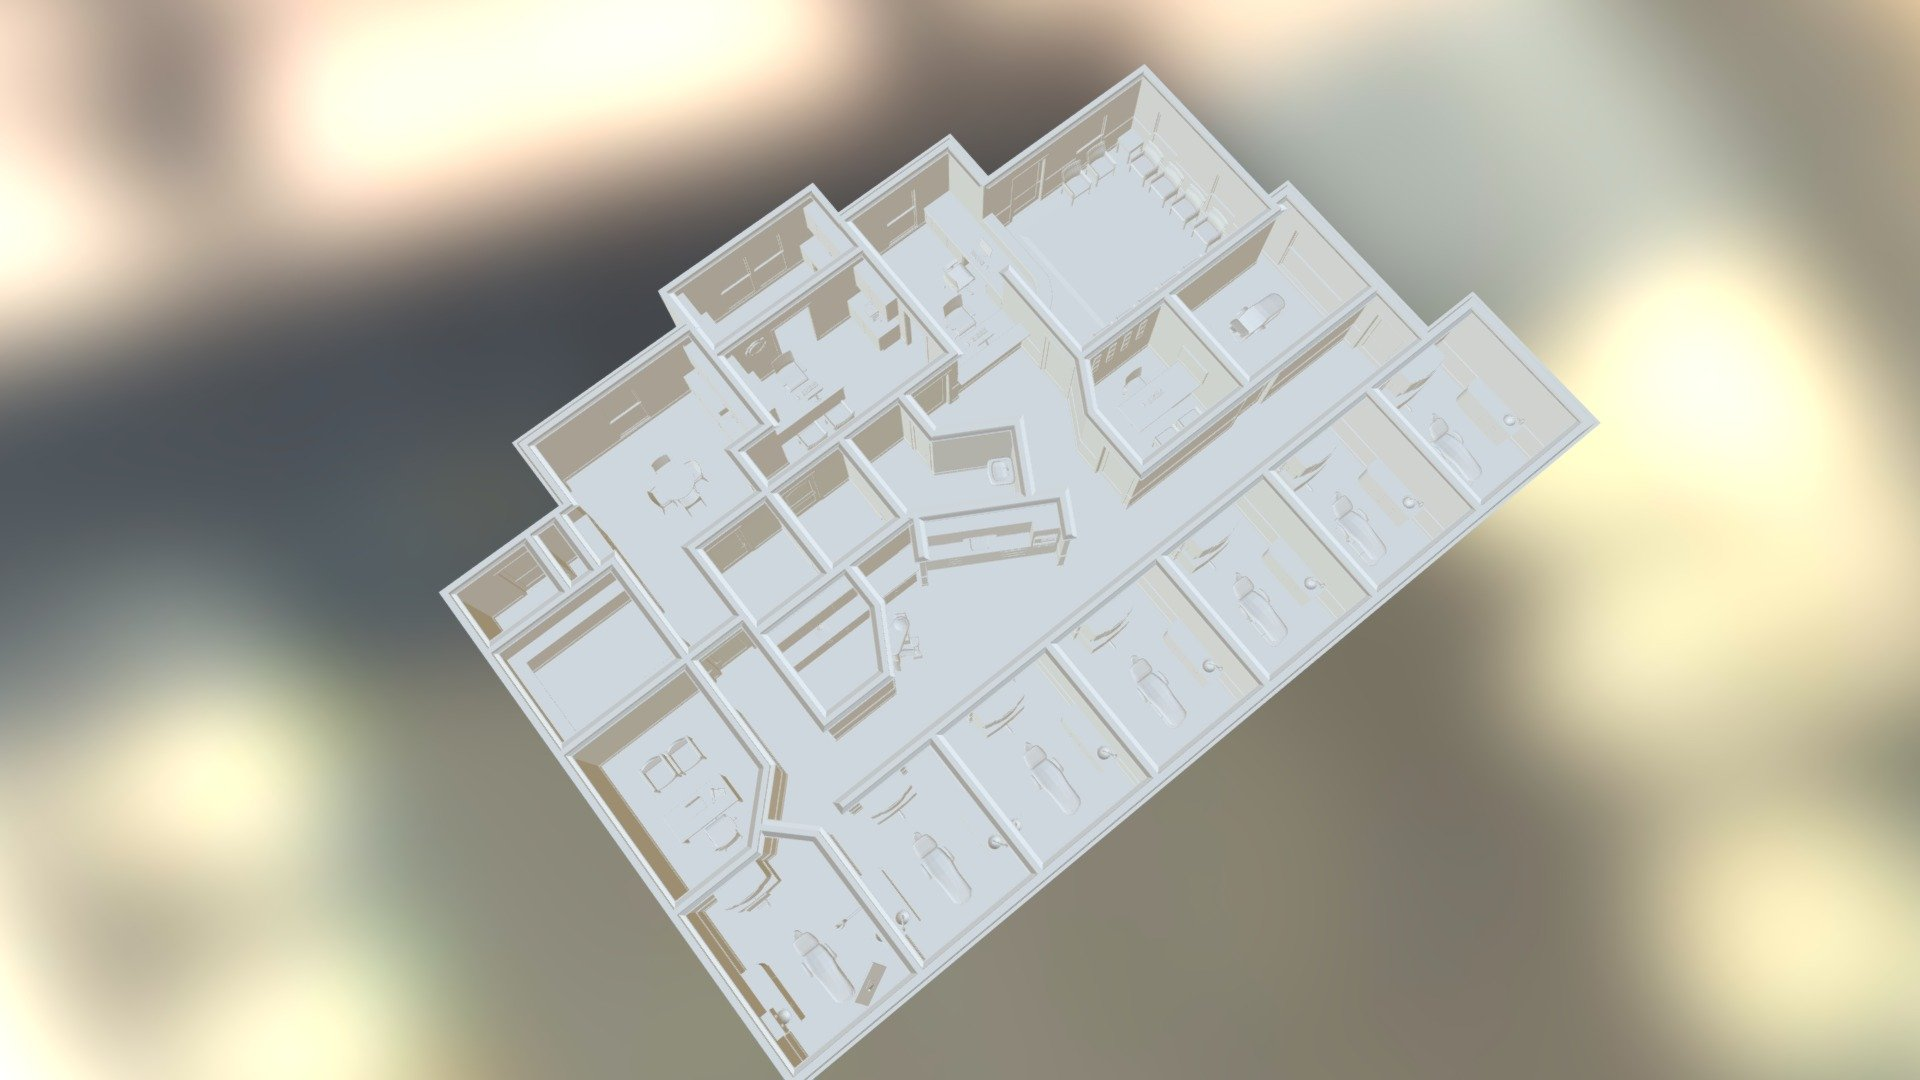 Creative Dental Floor Plans Mtalley56 Sketchfab